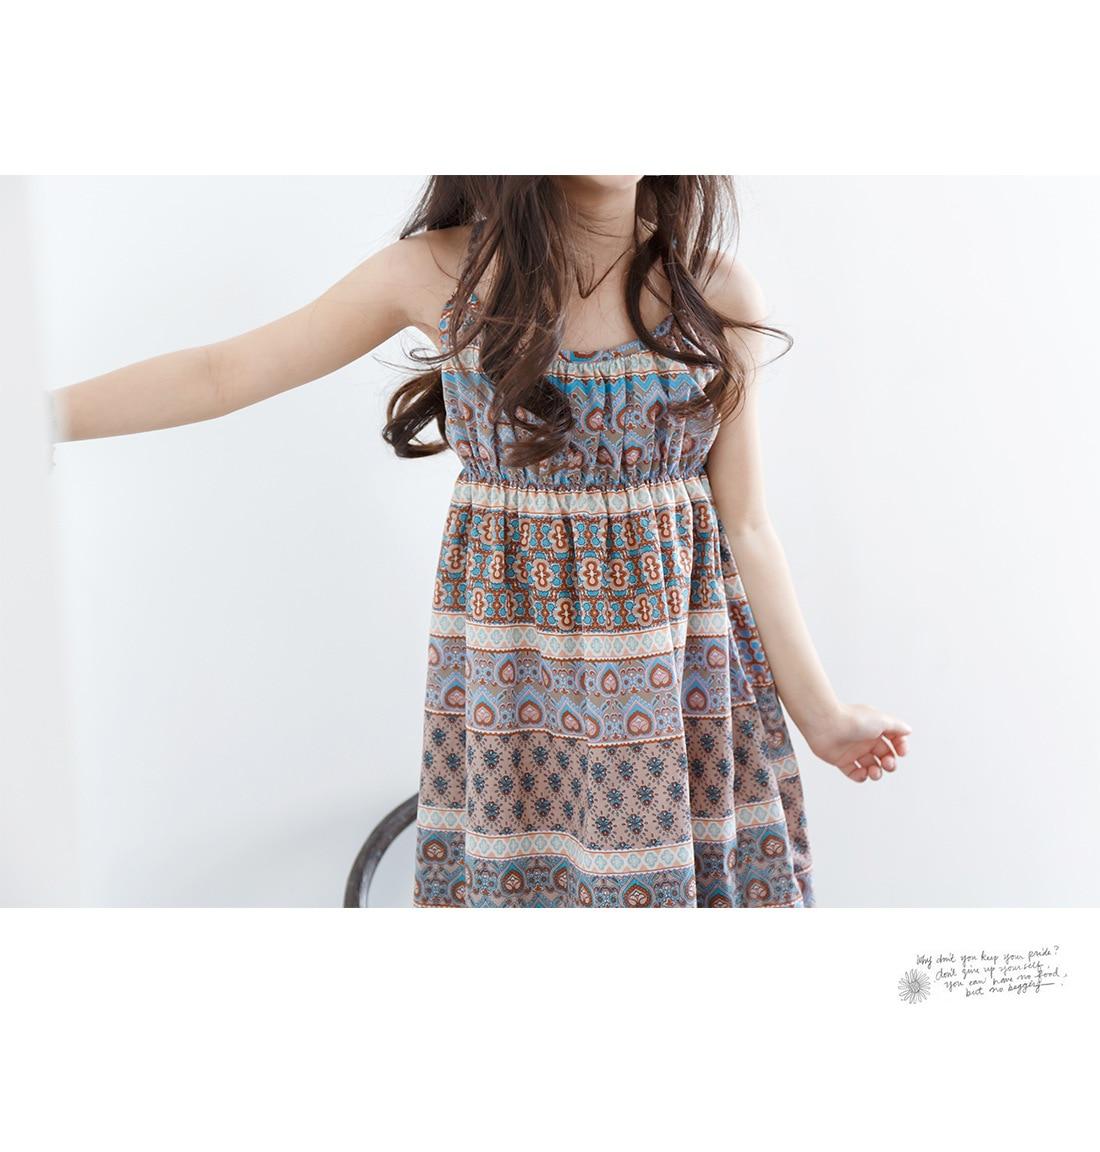 Big Girls Dress Summer Floral Teens Dresses Beach Off Shoulder Kids Clothes Chiffon Children Clothing For Girls 4 6 8 10 12 14